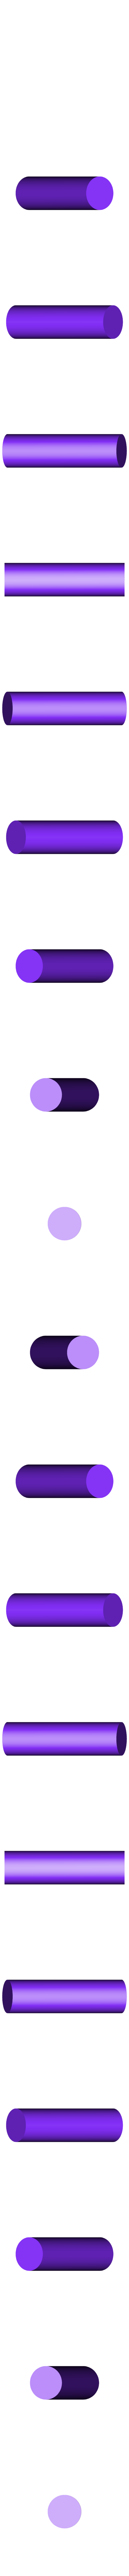 crosshead_pin_-_small.STL Download free STL file 4-8-8-4 Big Boy Locomotive • 3D printer object, RaymondDeLuca